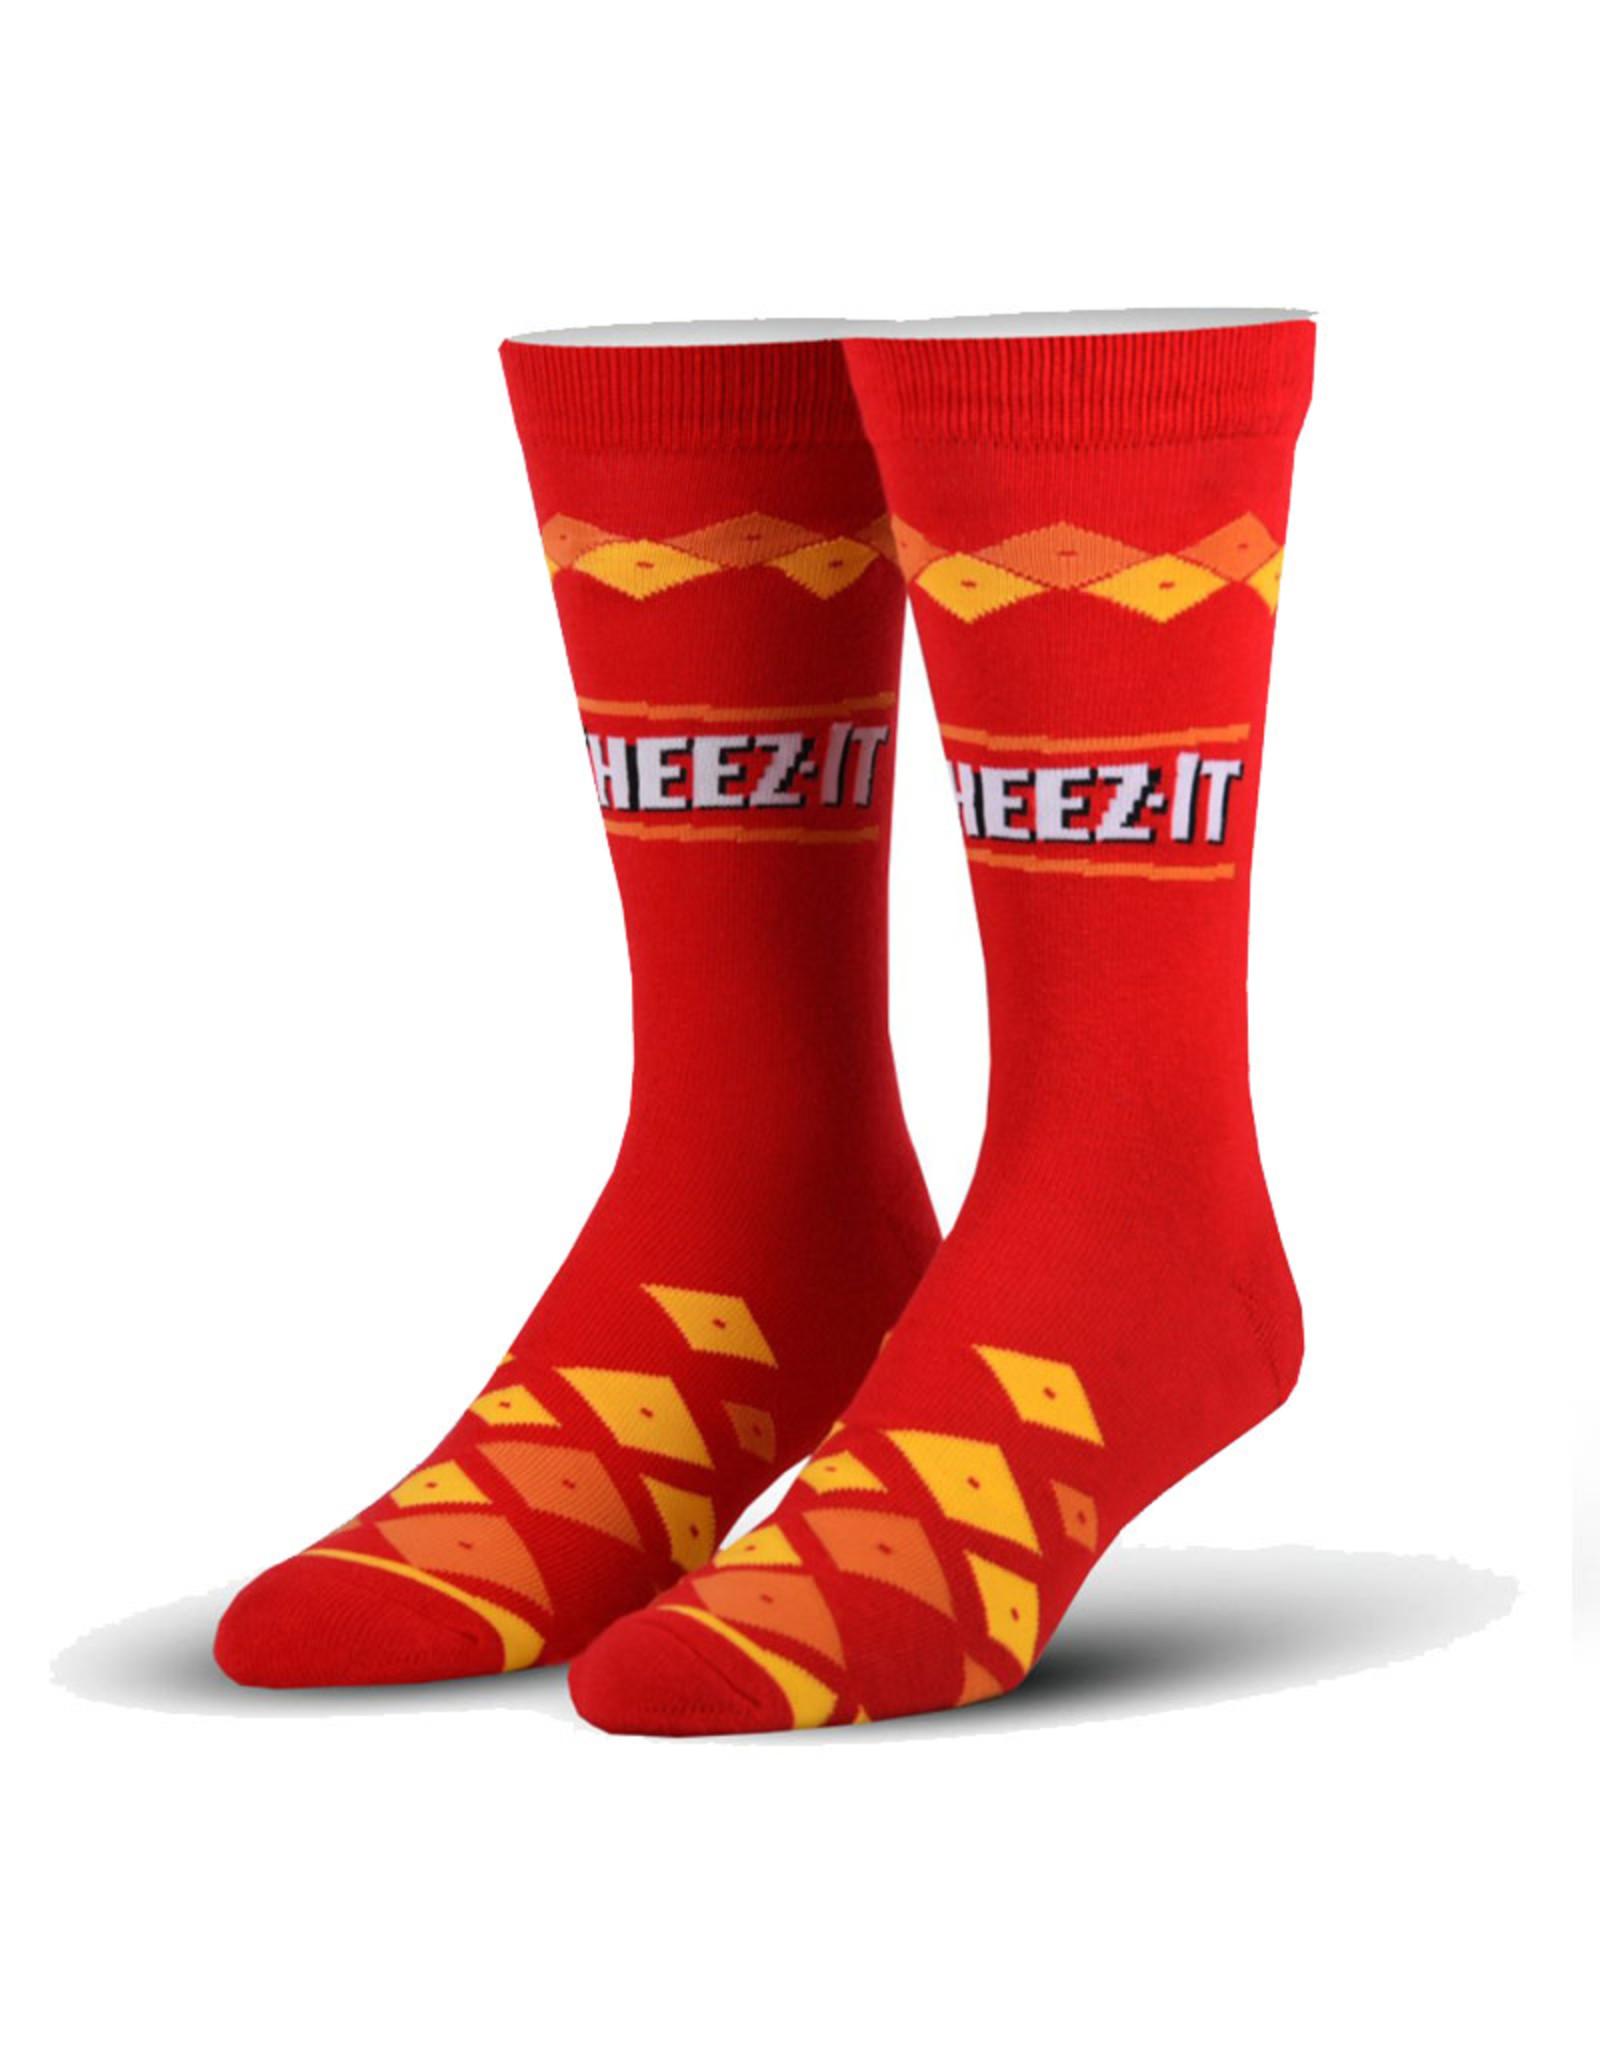 Cheez-it ( Cool Socks Sock )